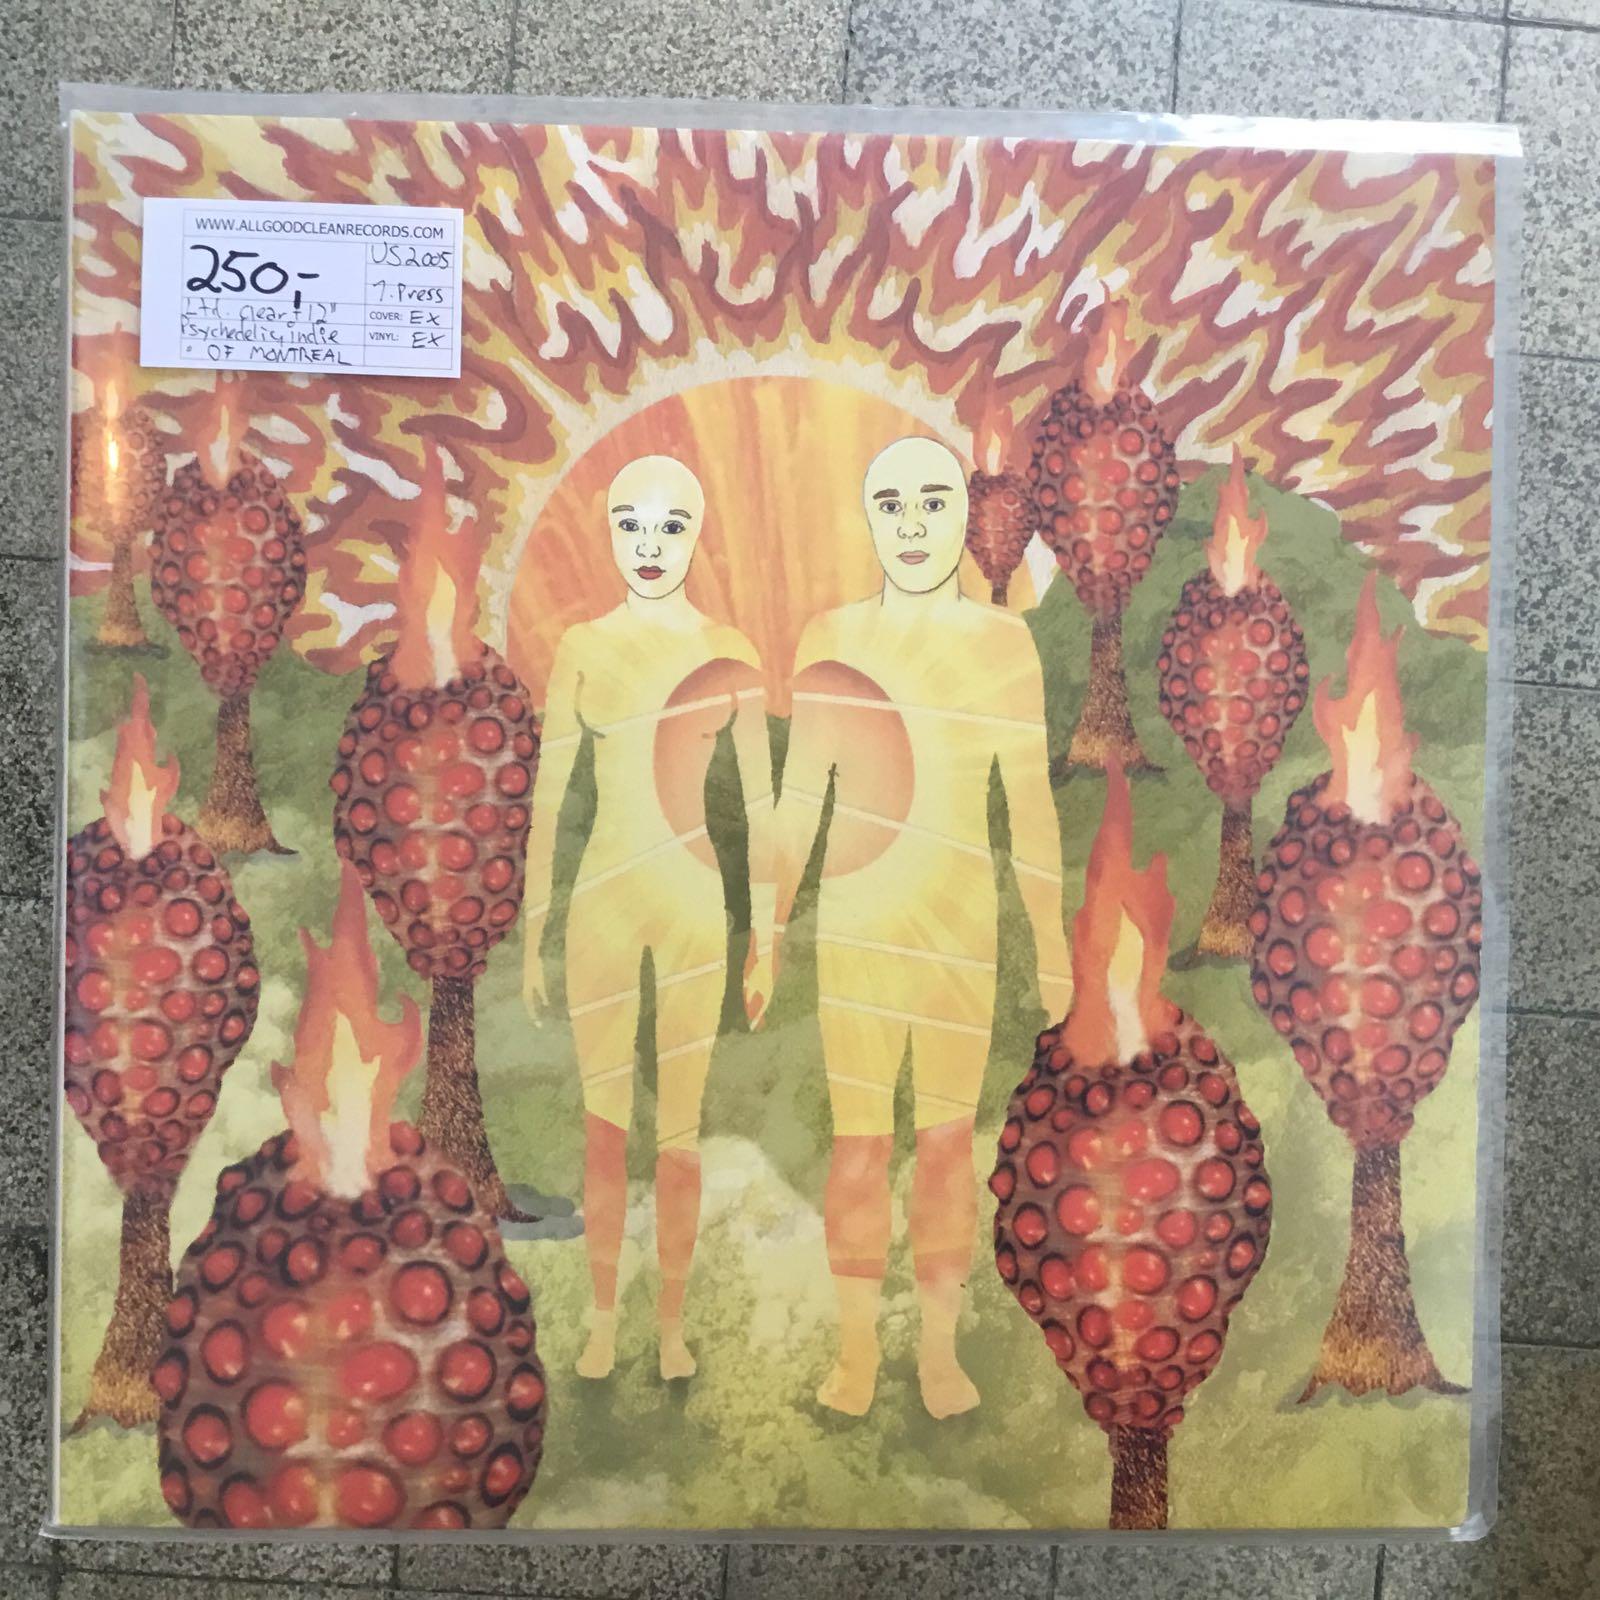 Of Montreal - The Sunlandic Twins [LTD 2xLP] (2. hand)